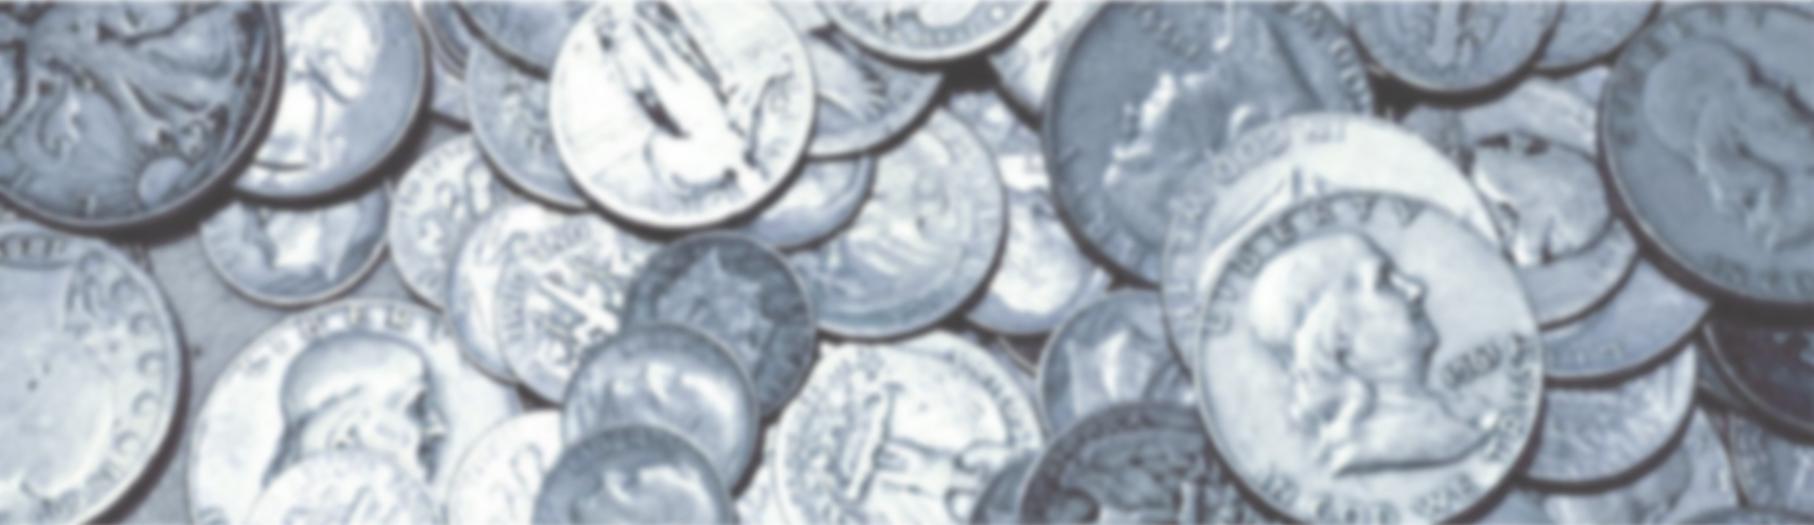 coins-bg